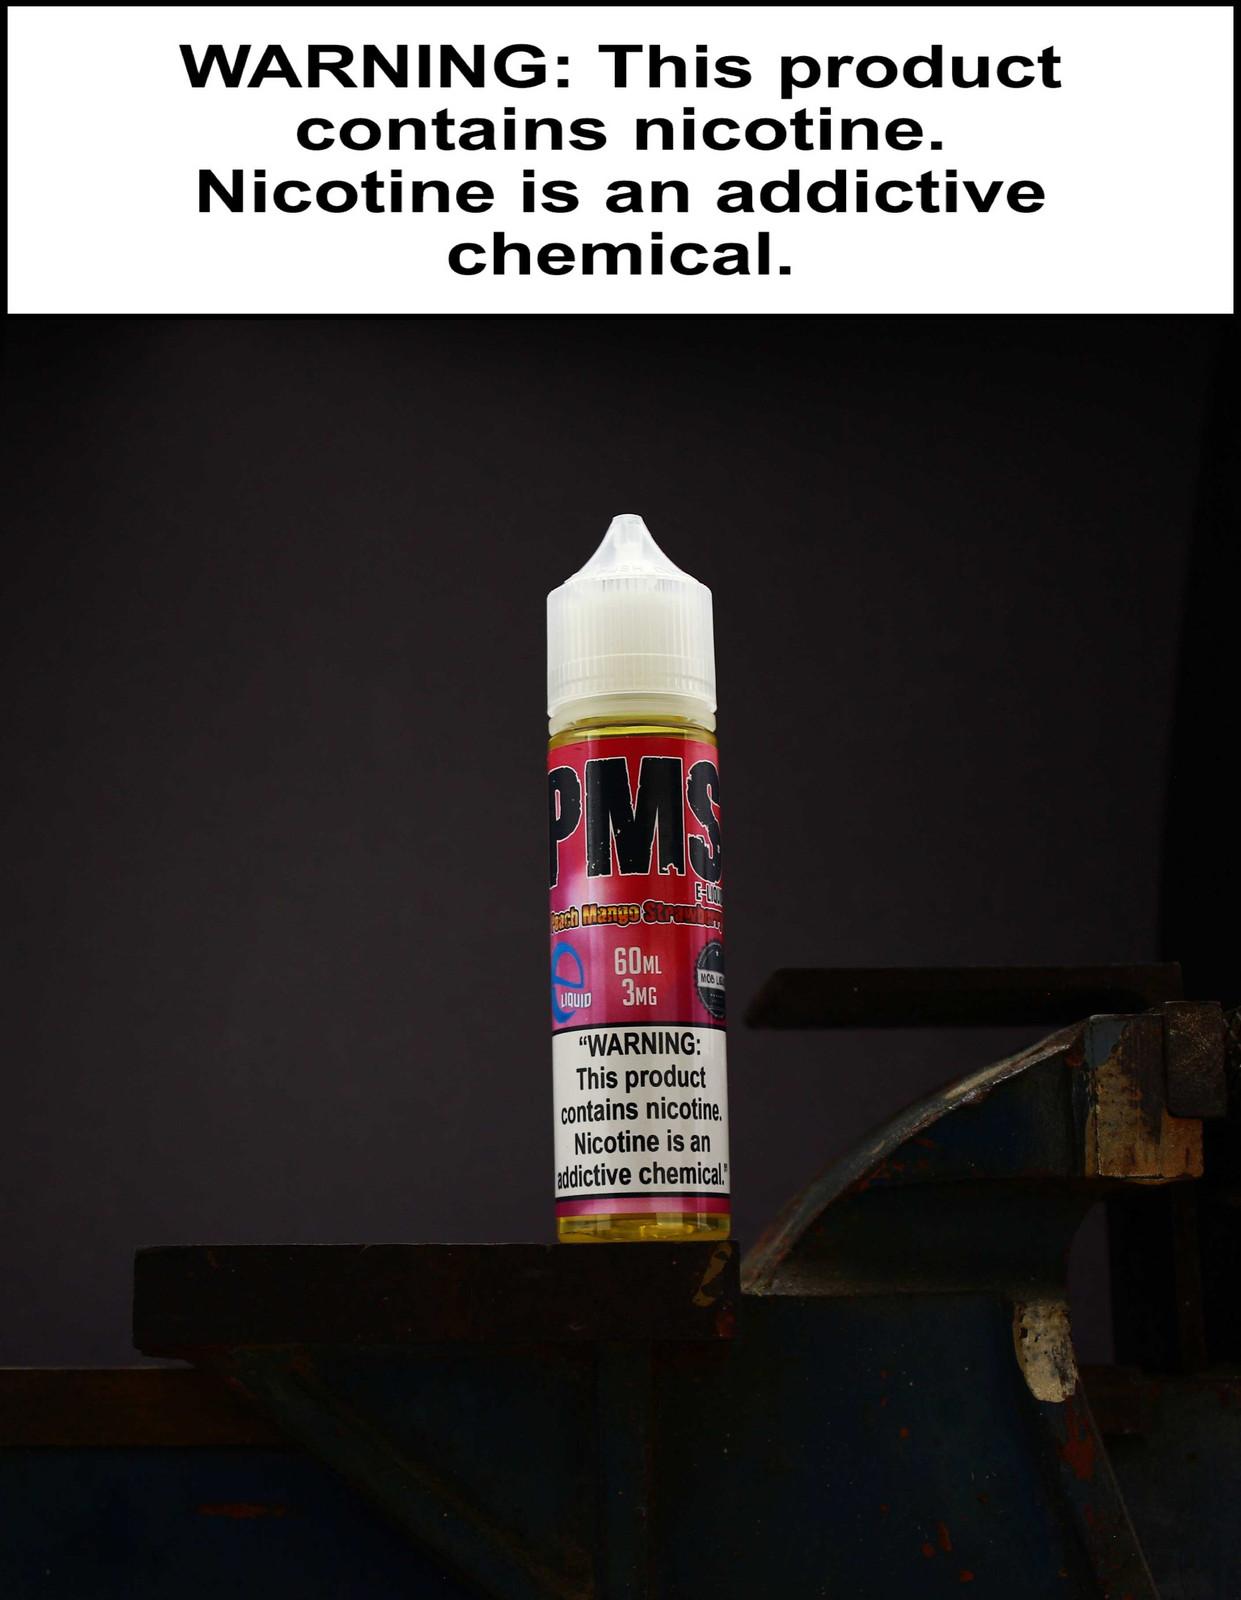 Current E Juice United States This Old Vape Shop Liquid Orange Mint Chiller 60ml Nic 3mg Pms